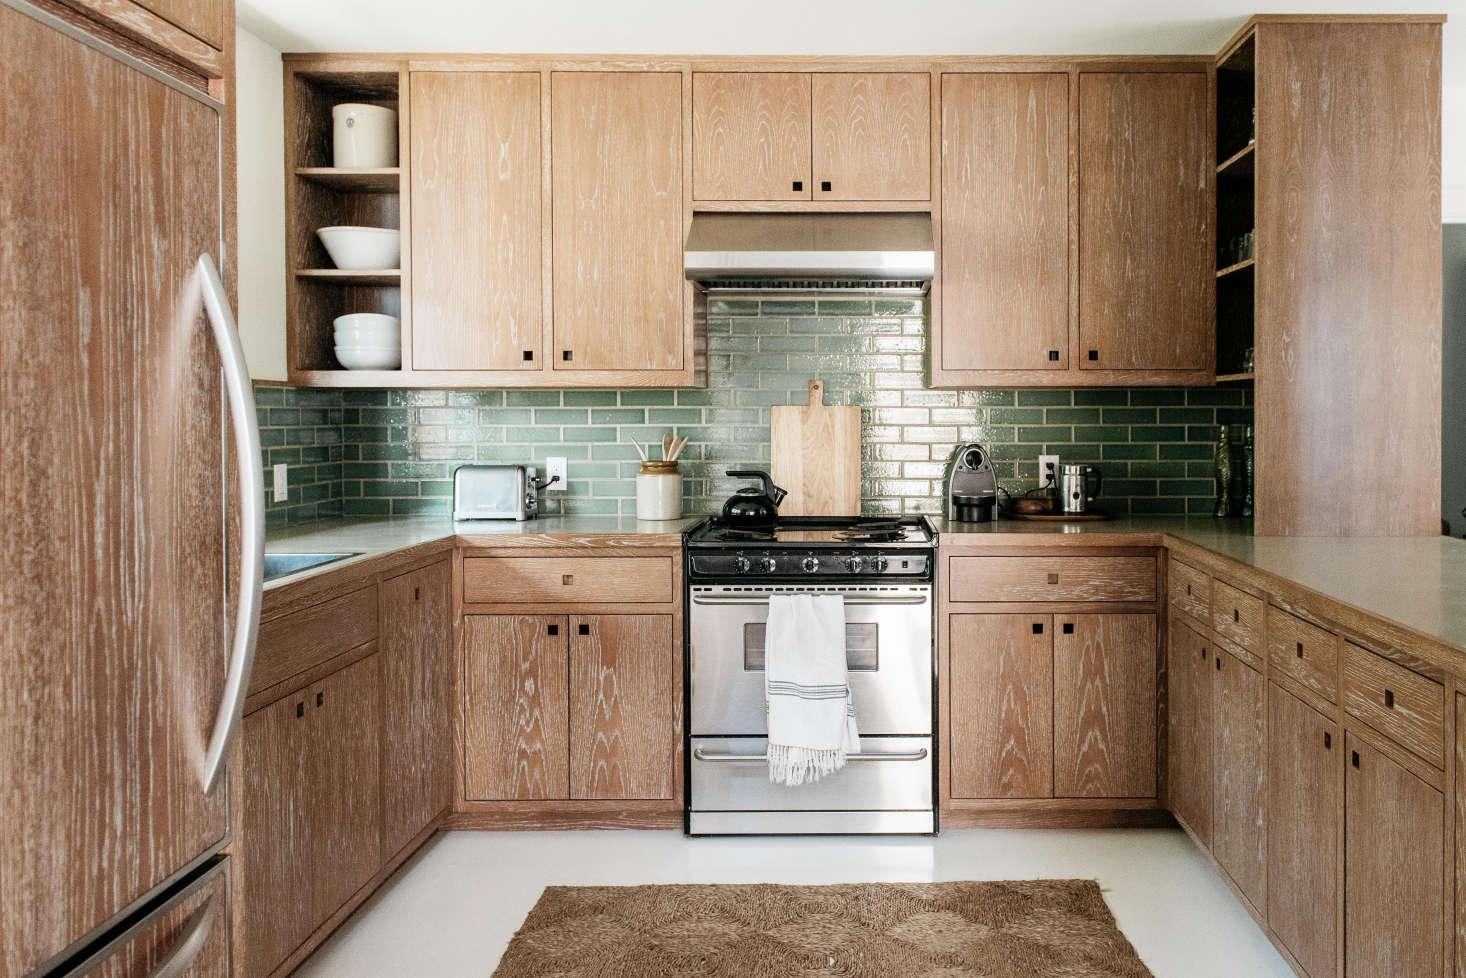 10x10 kitchen remodel cost mixer machine remodeling 101 u shaped design